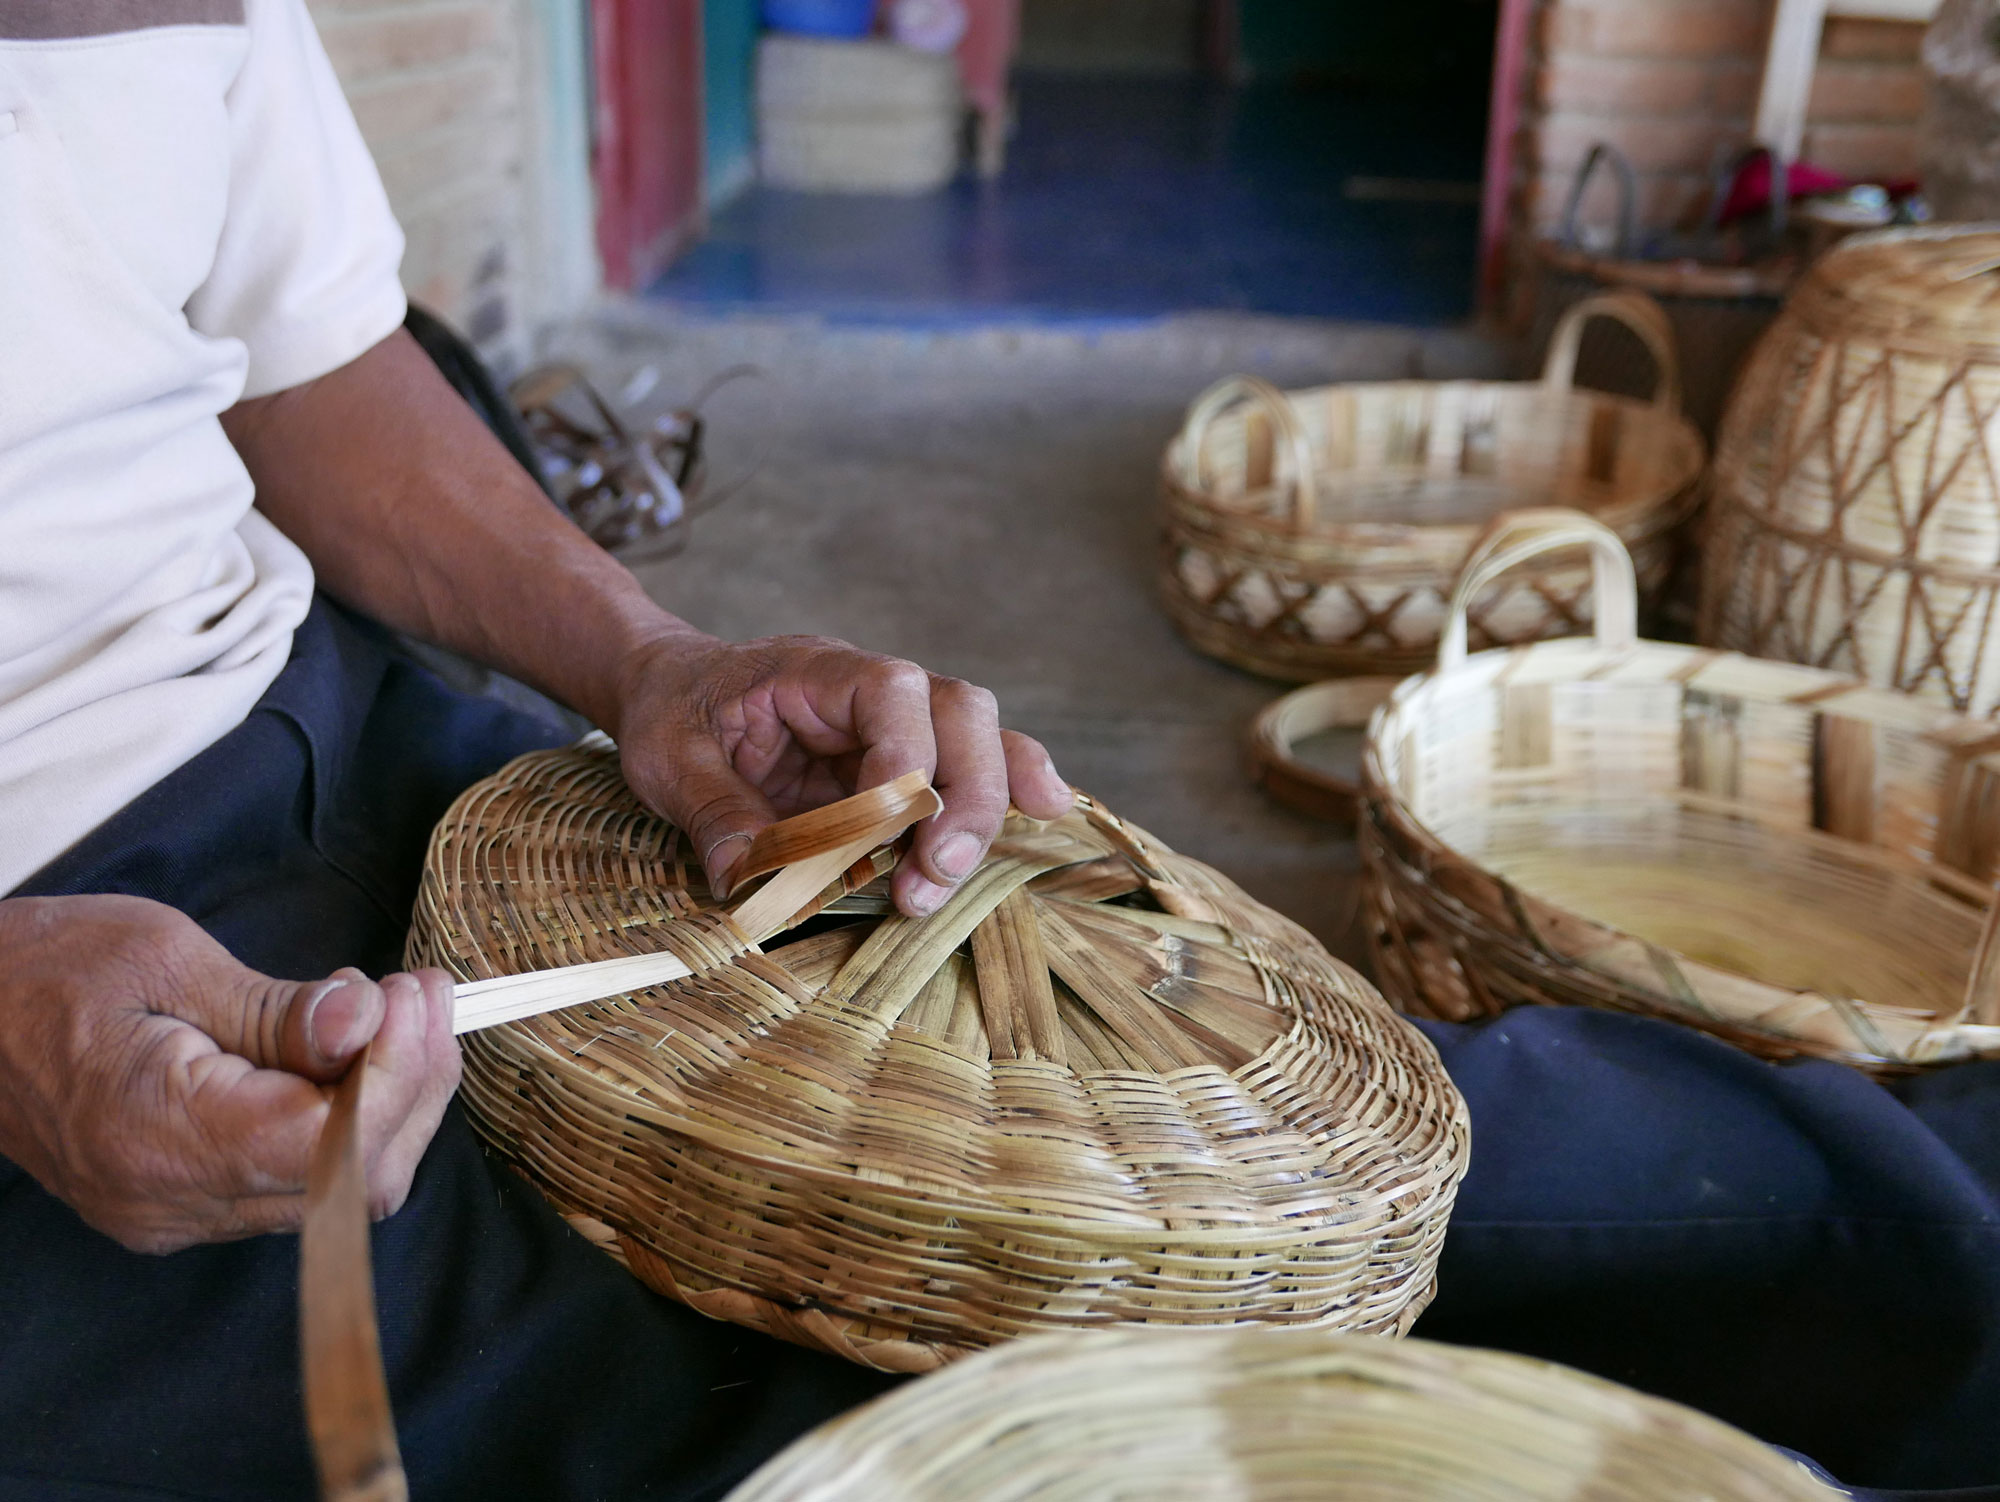 How to Weave a Basket in Oaxaca Mexico - www.nidocollective.com/carrizoweaving #carrizo #canastascarrizo #mexicanartisancrafts